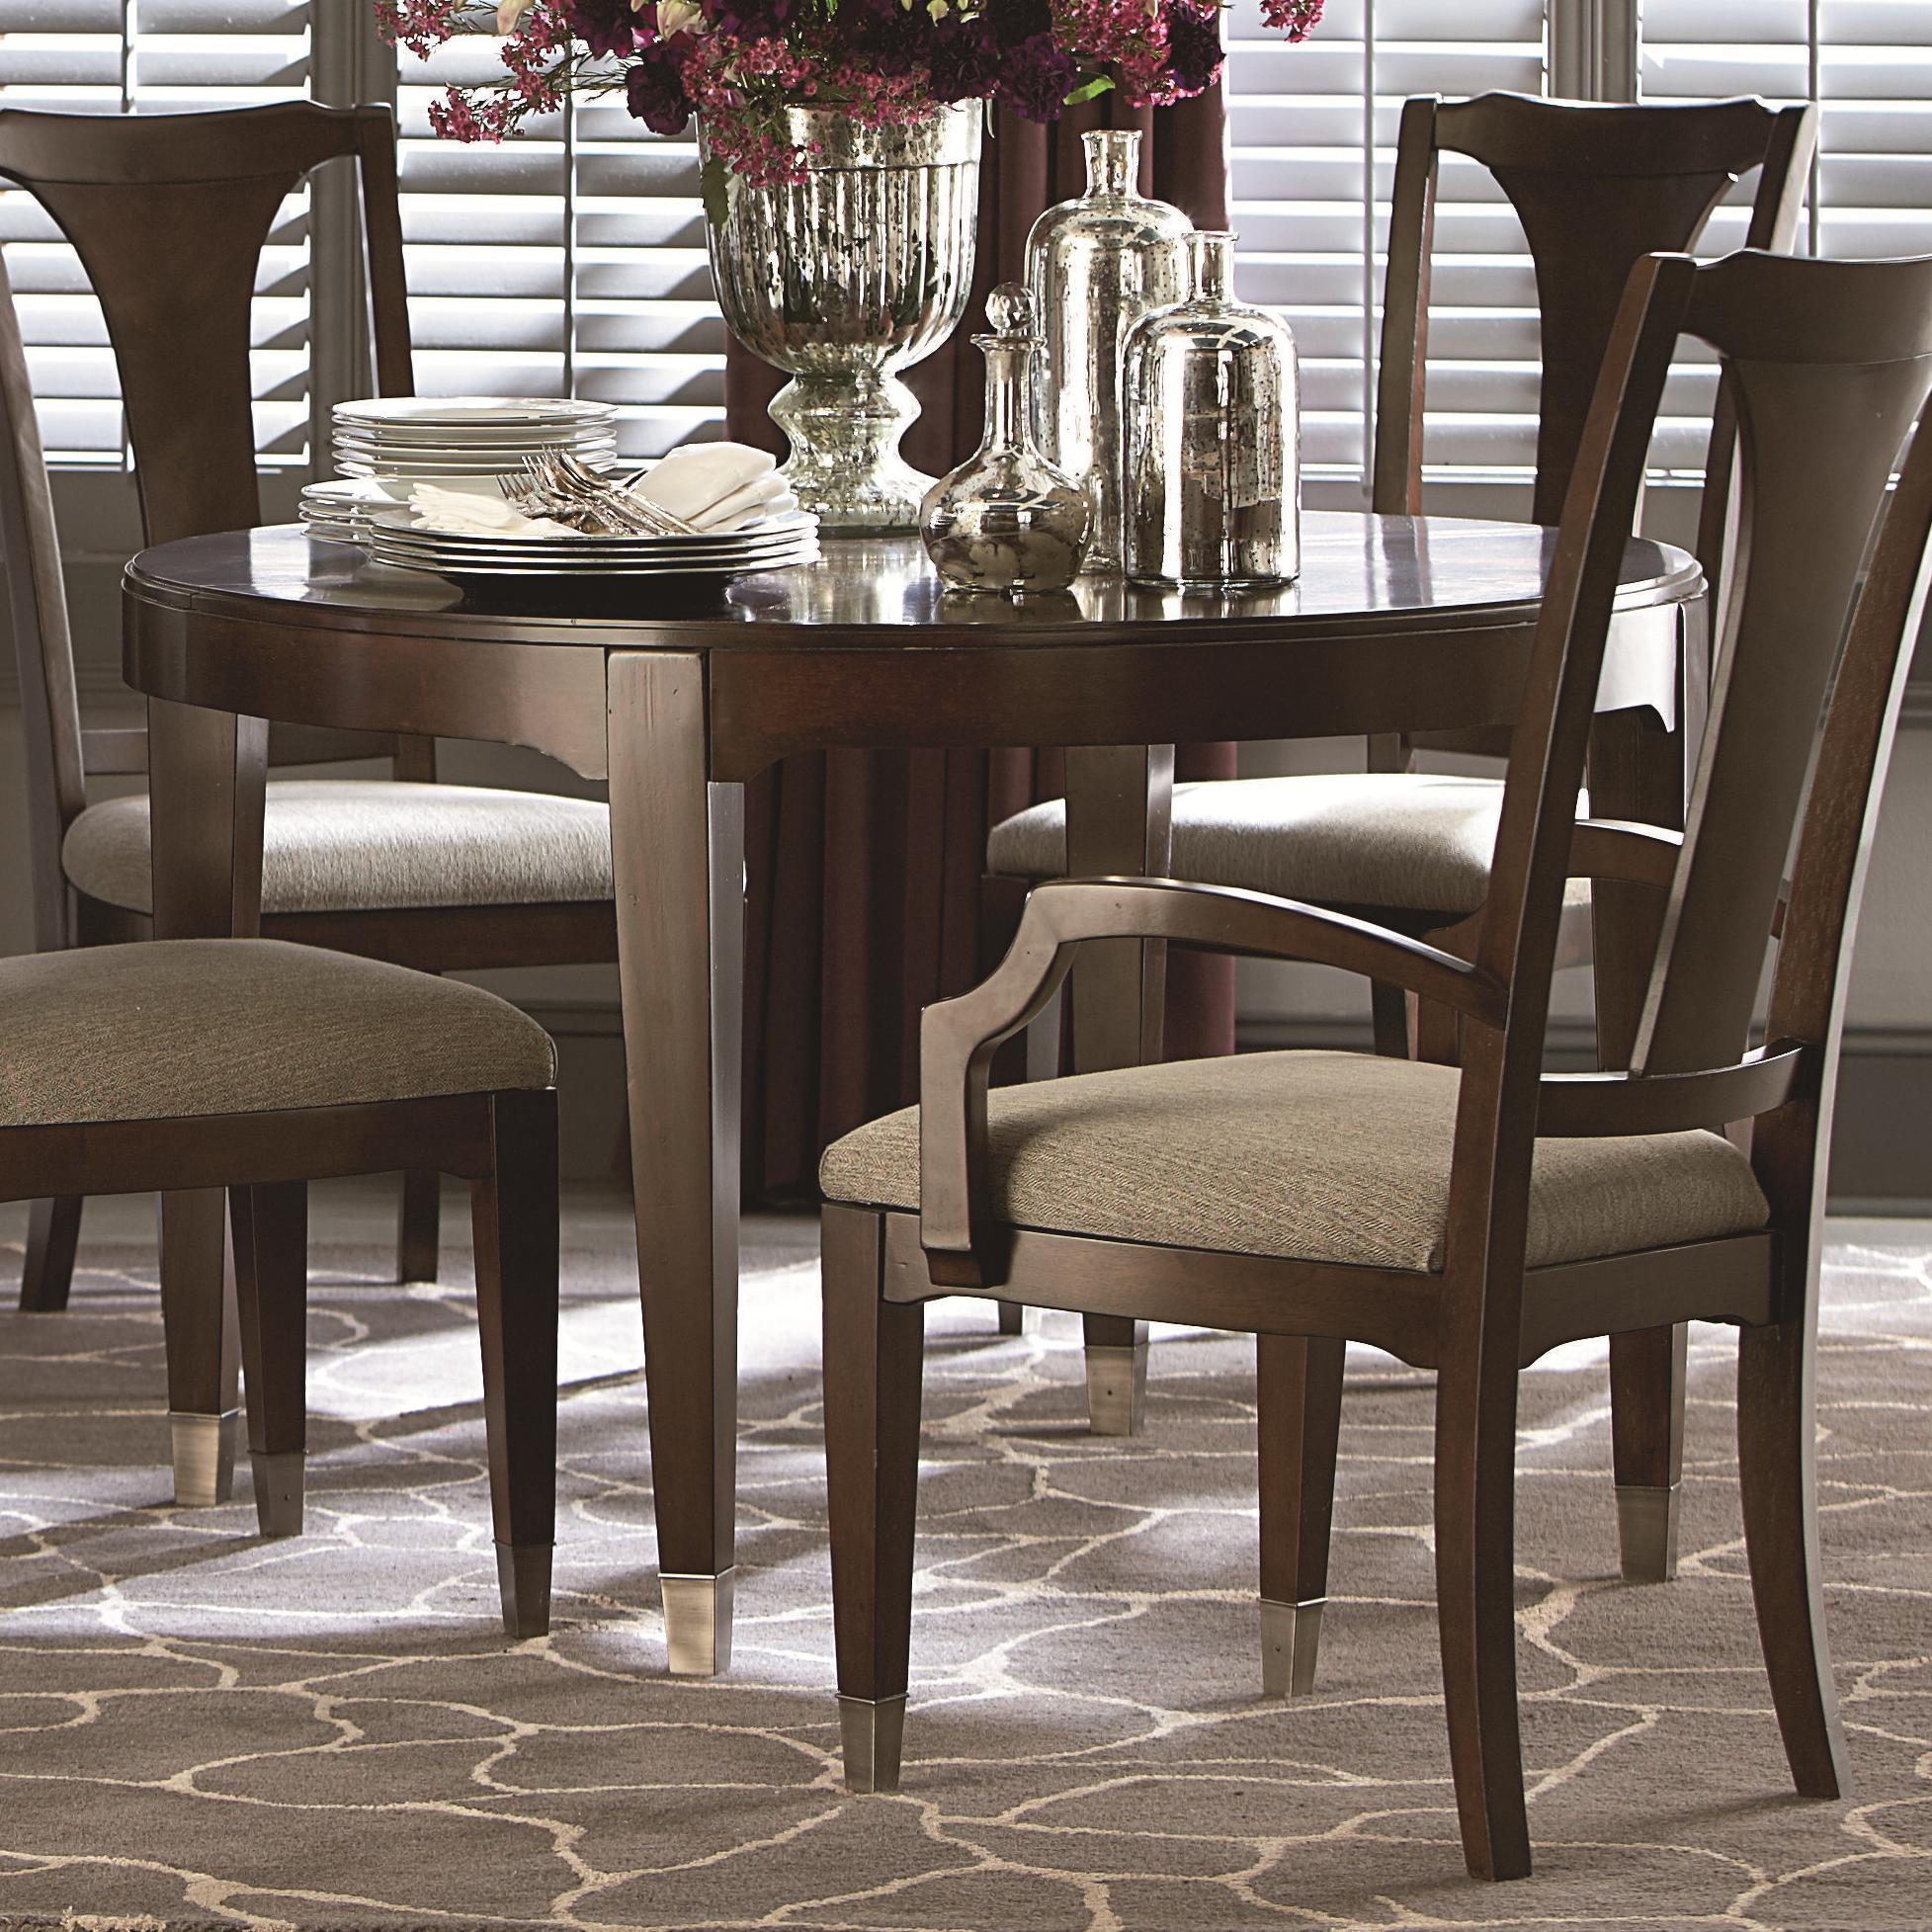 Bassett furniture dining room sets